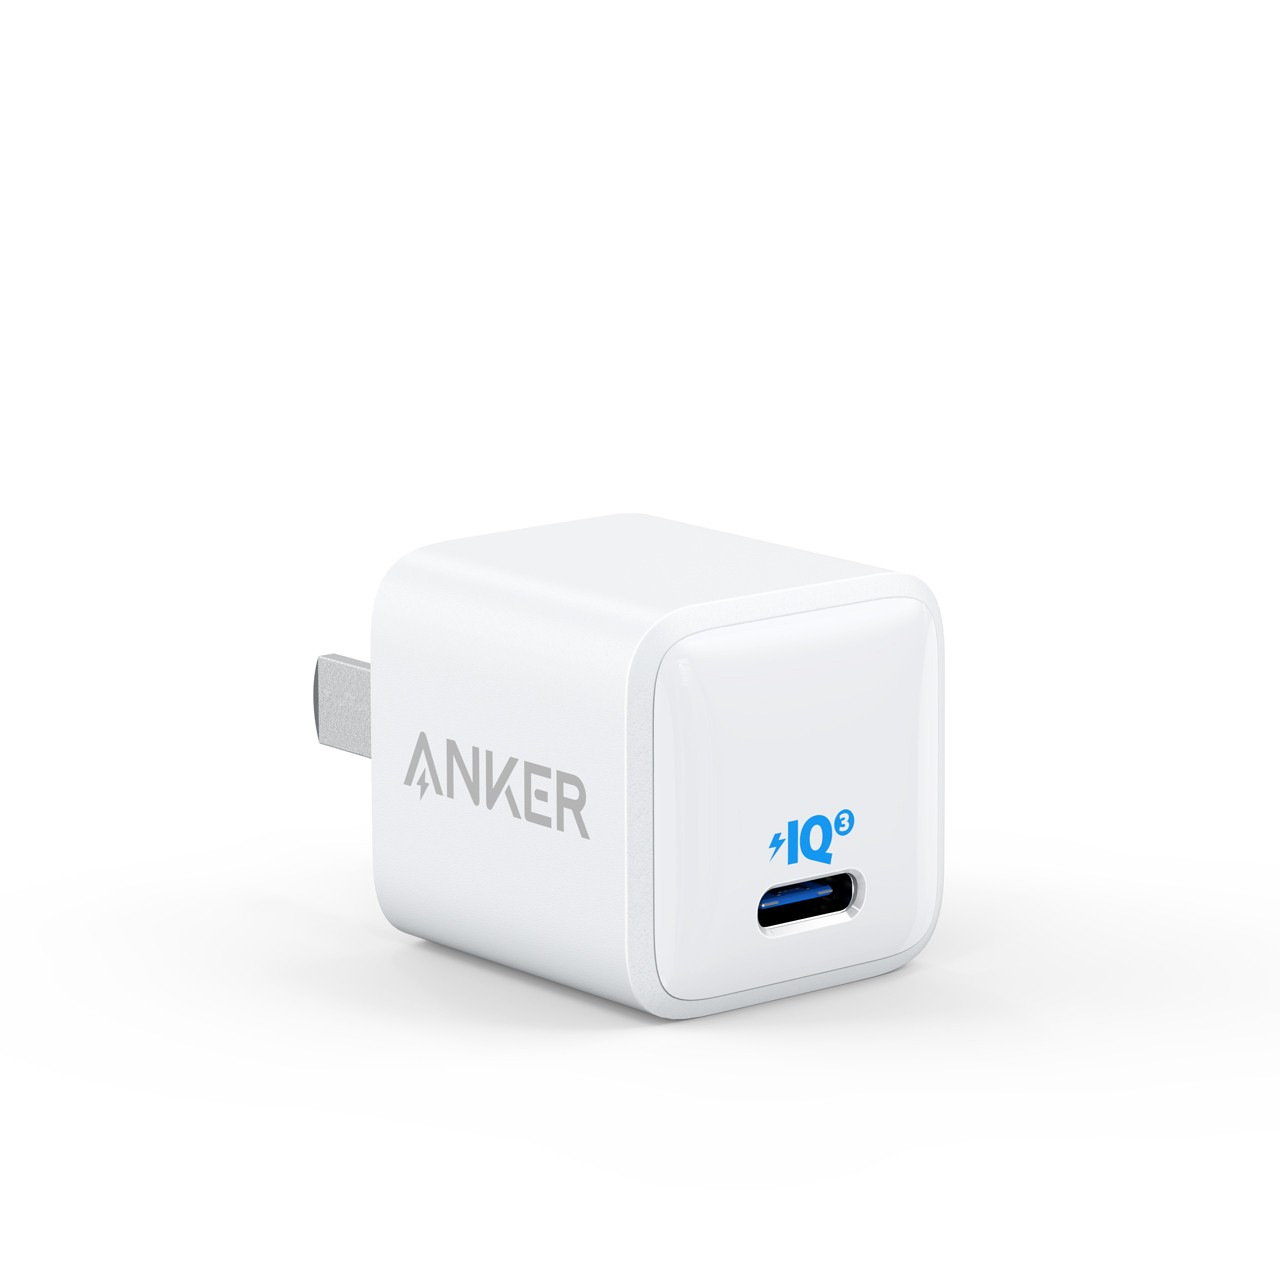 Anker安克 苹果快充Nano PD20W充电器兼容18W充电头 iPhone12/11pro/SE2/Xs/XR/8小米/iPad/Type-C数据线插头